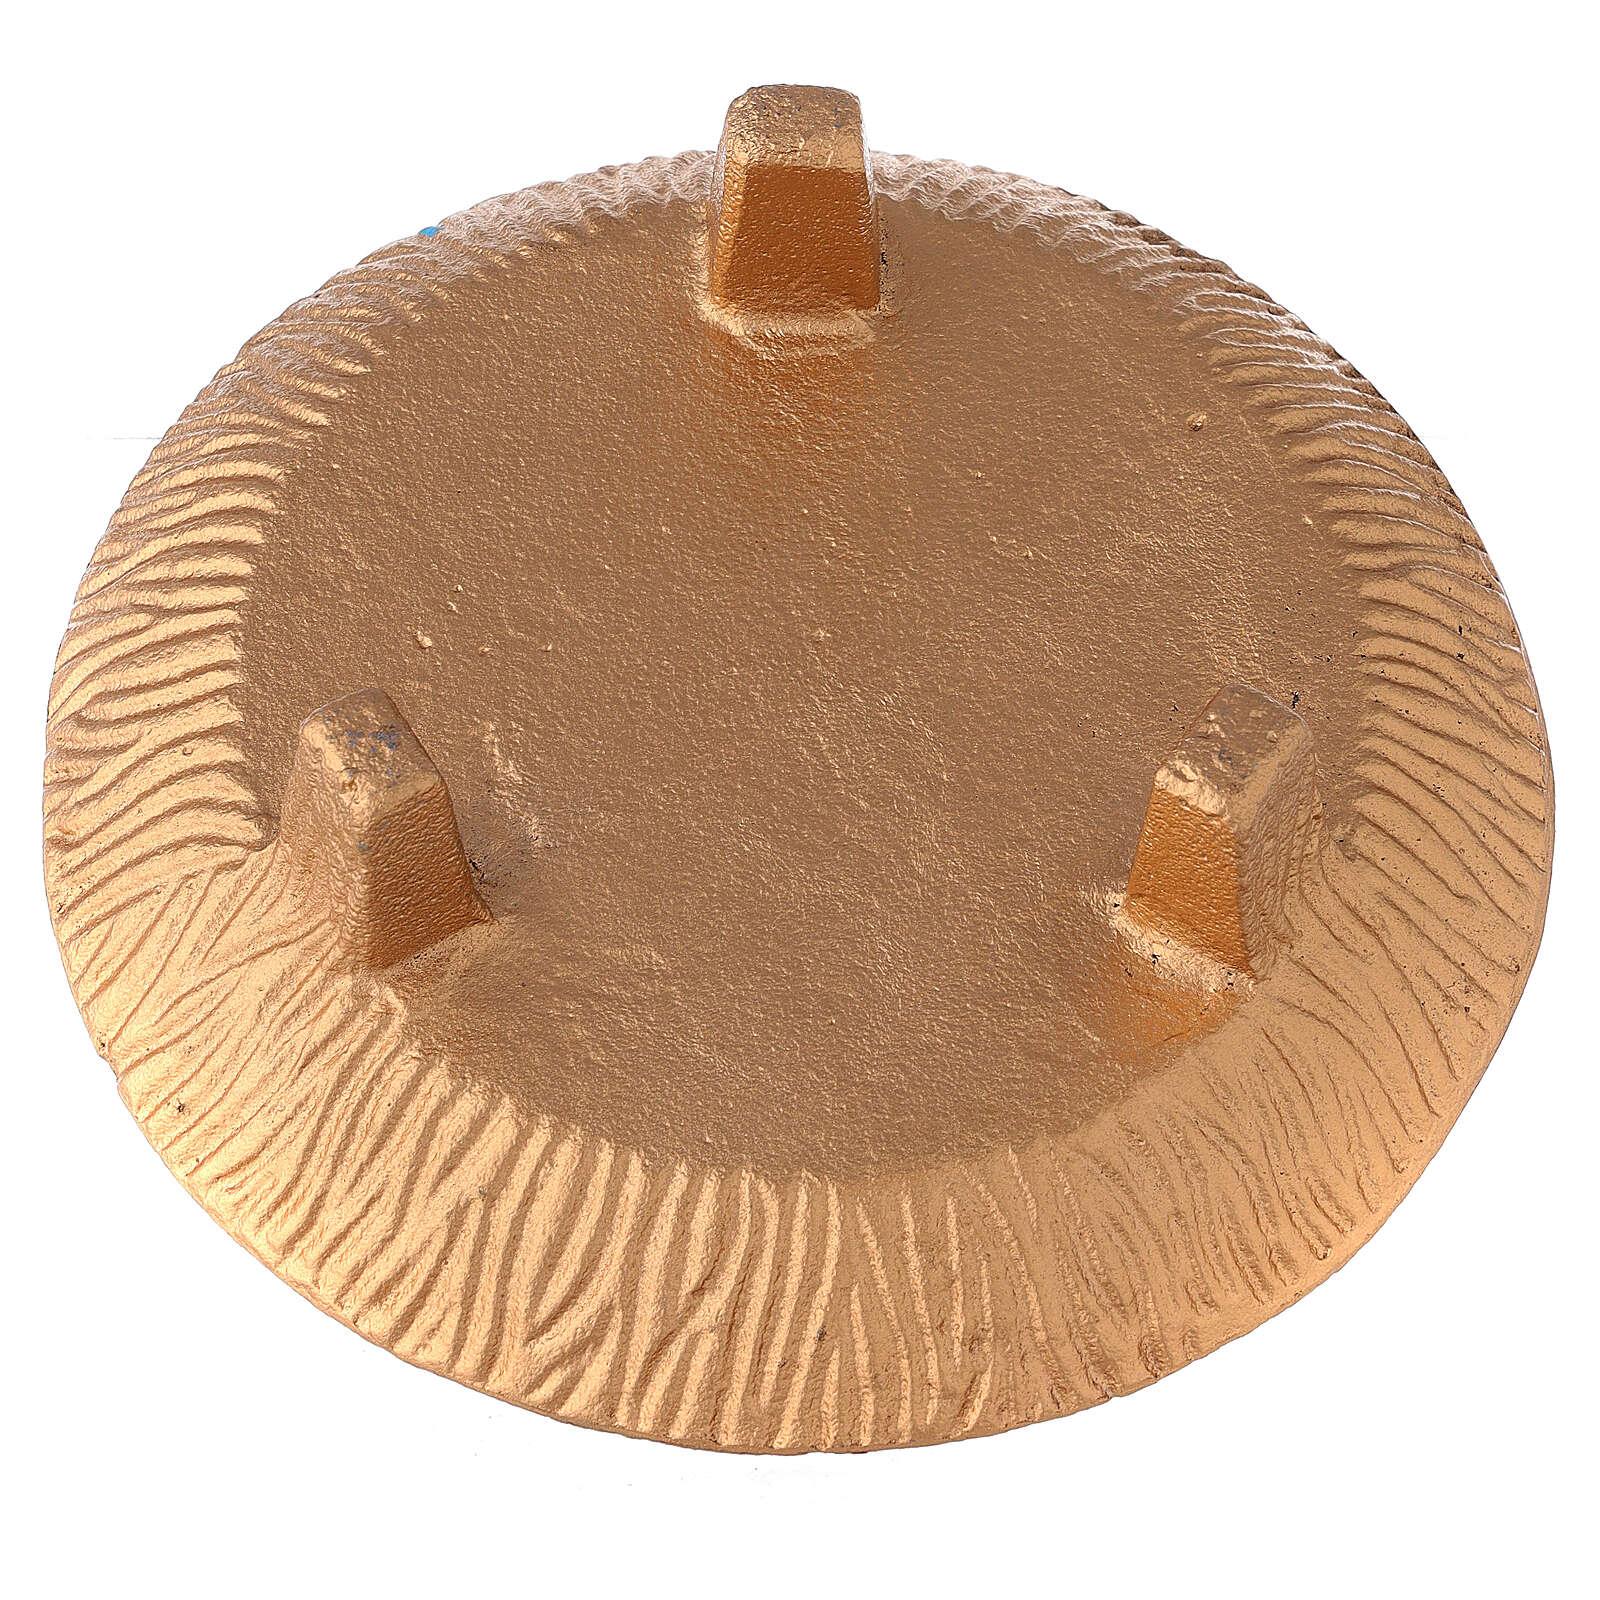 Escudilla para incienso 18 cm aluminio dorado bruñido 3